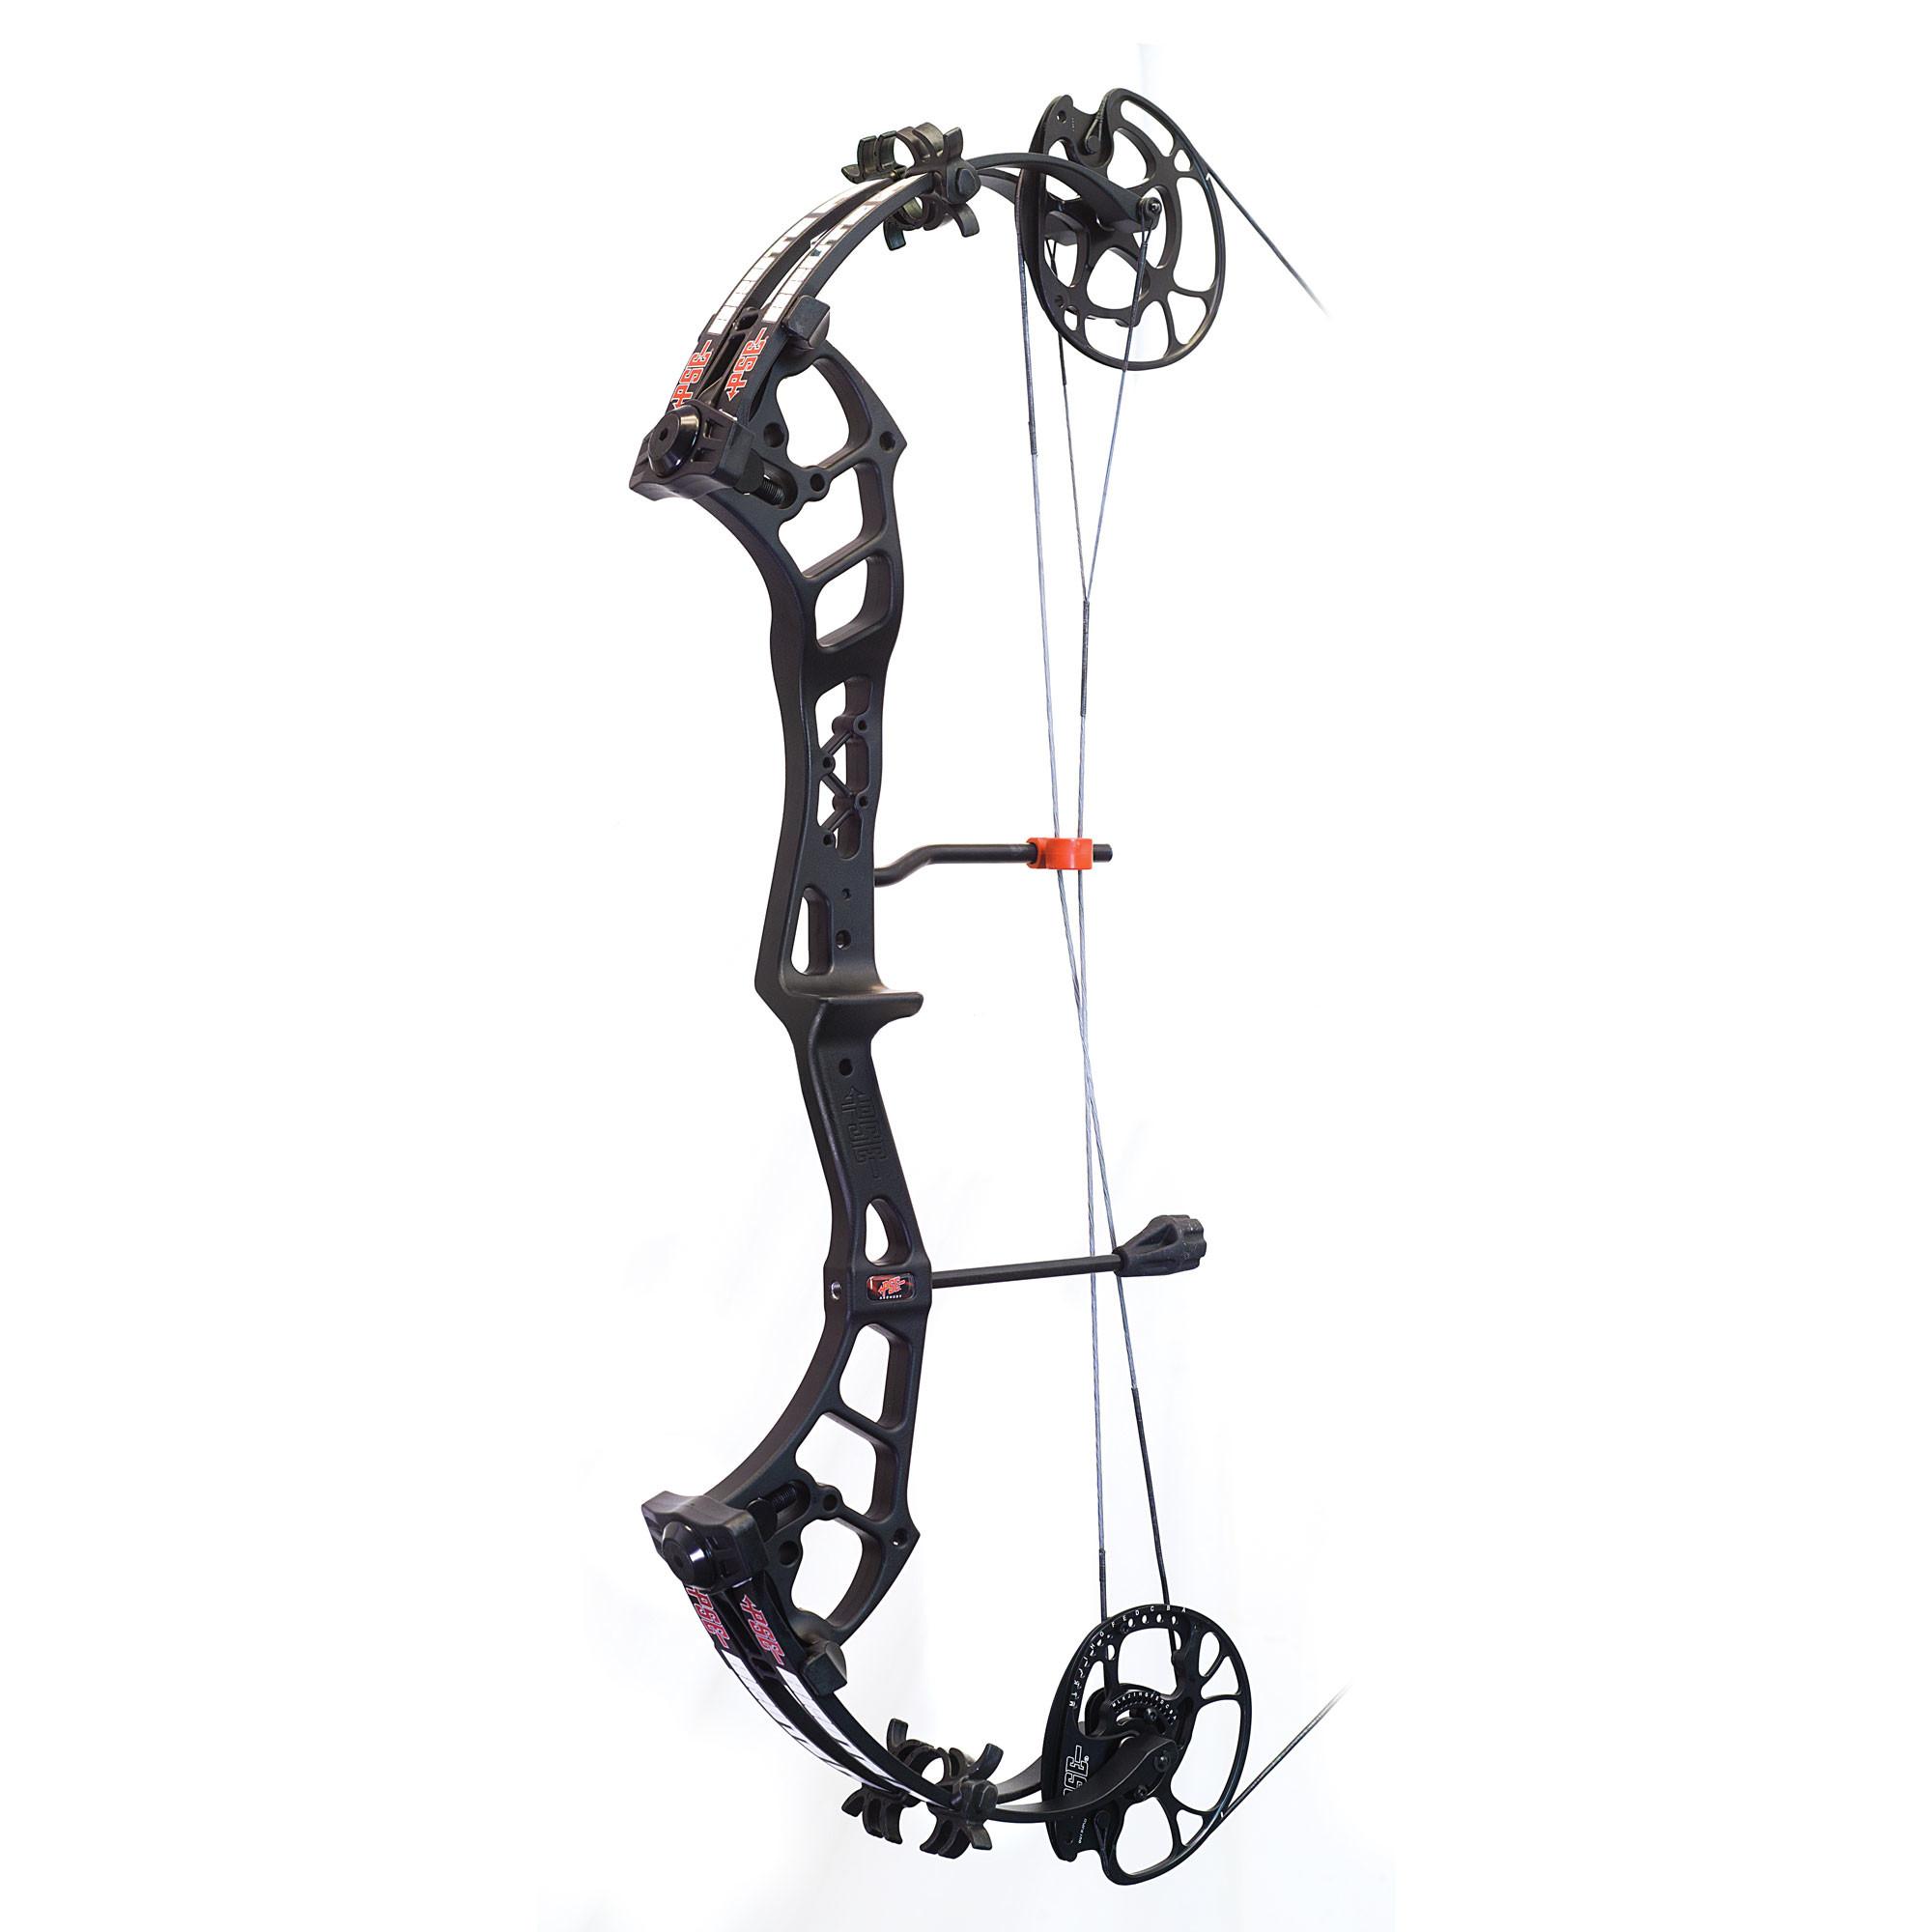 Res: 2000x2000, brute force™ lite – pse archery